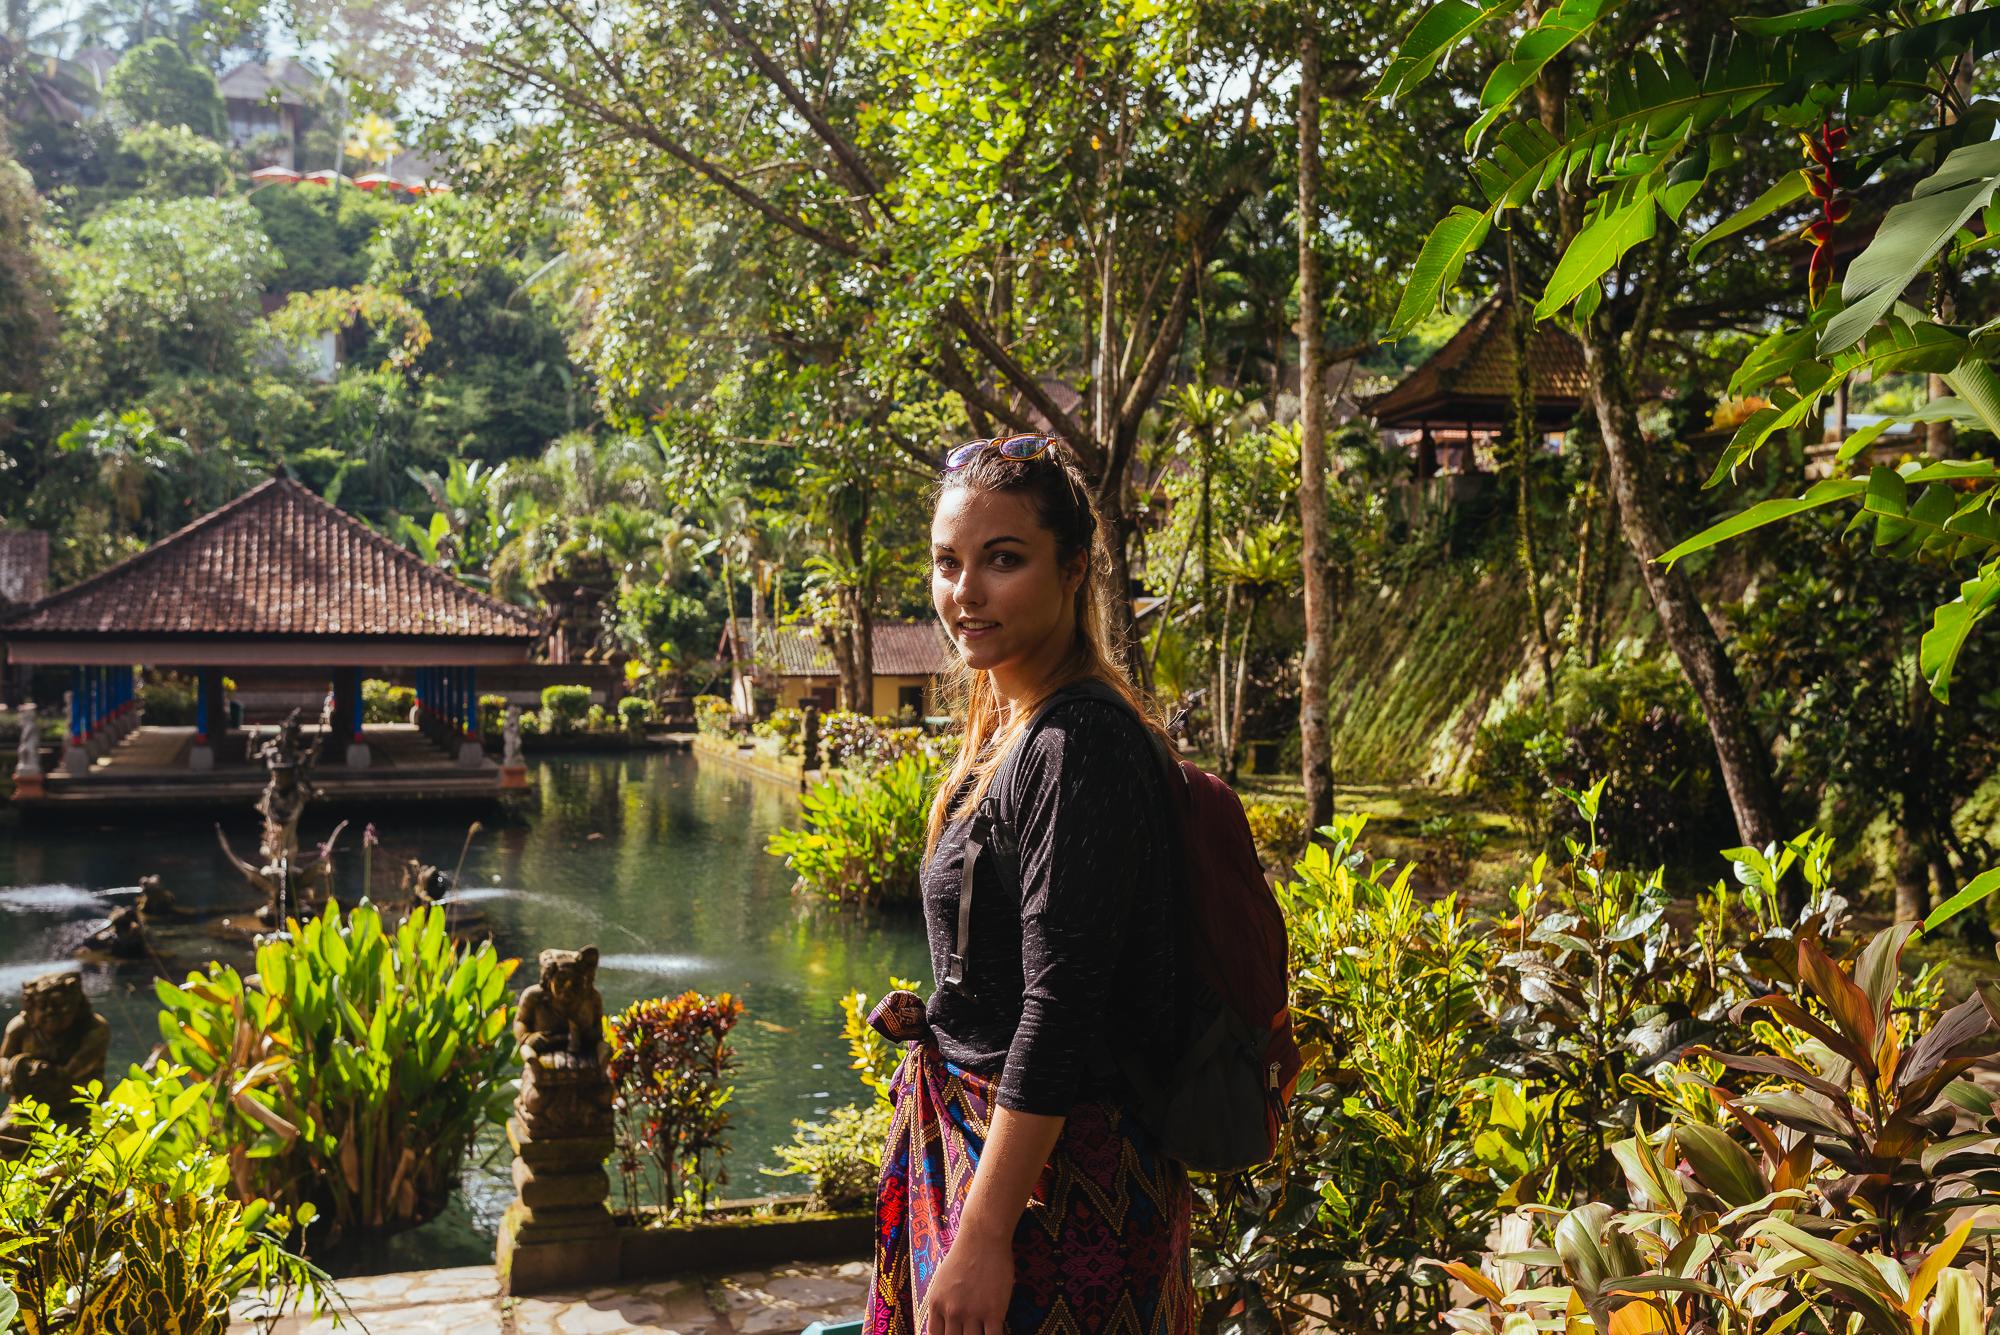 indonesia_2017-338.jpg